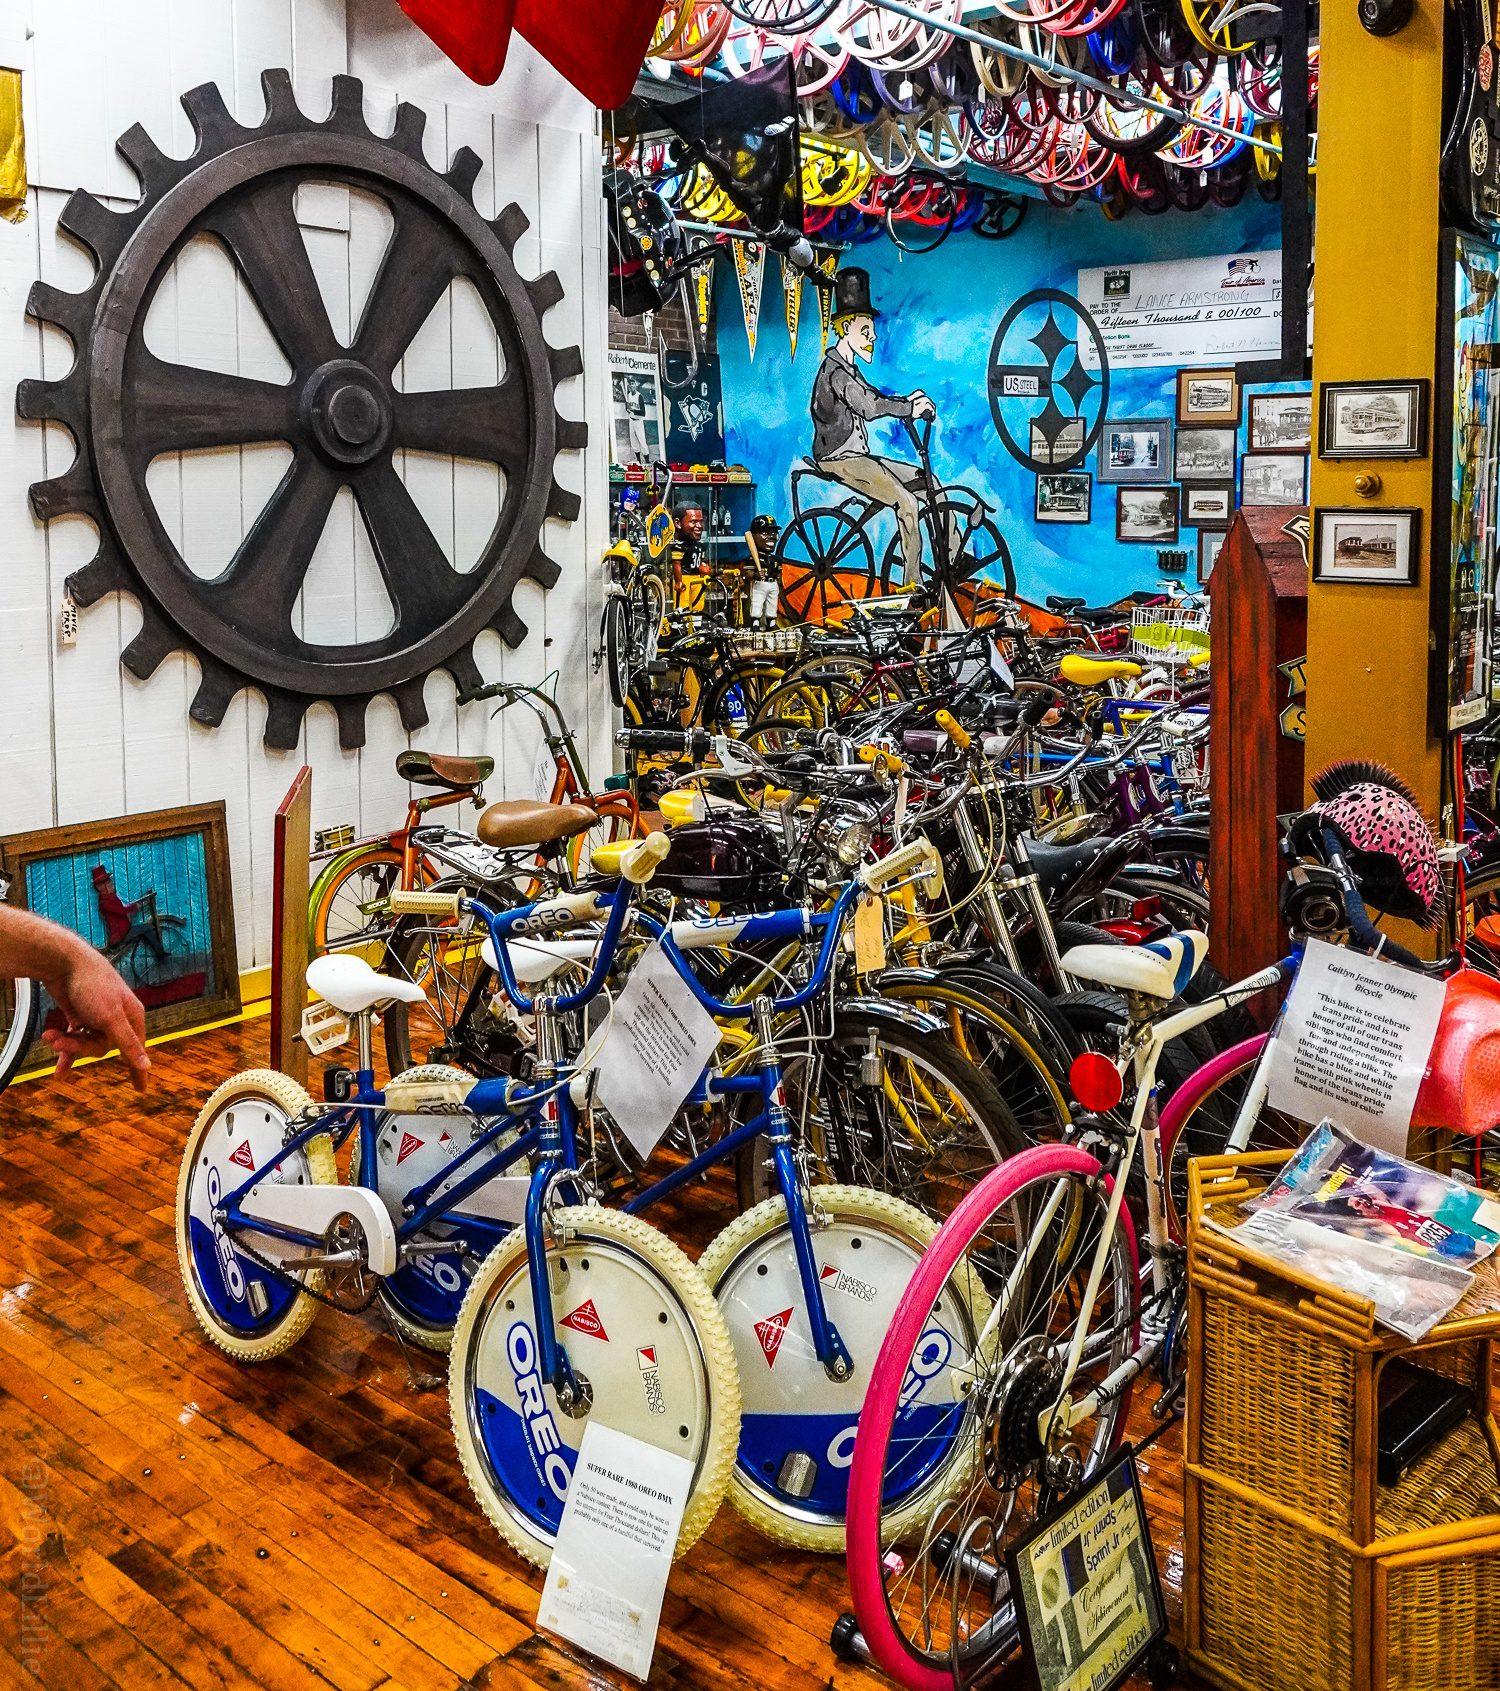 A 1980 Oreo BMX bike worth $4,000.